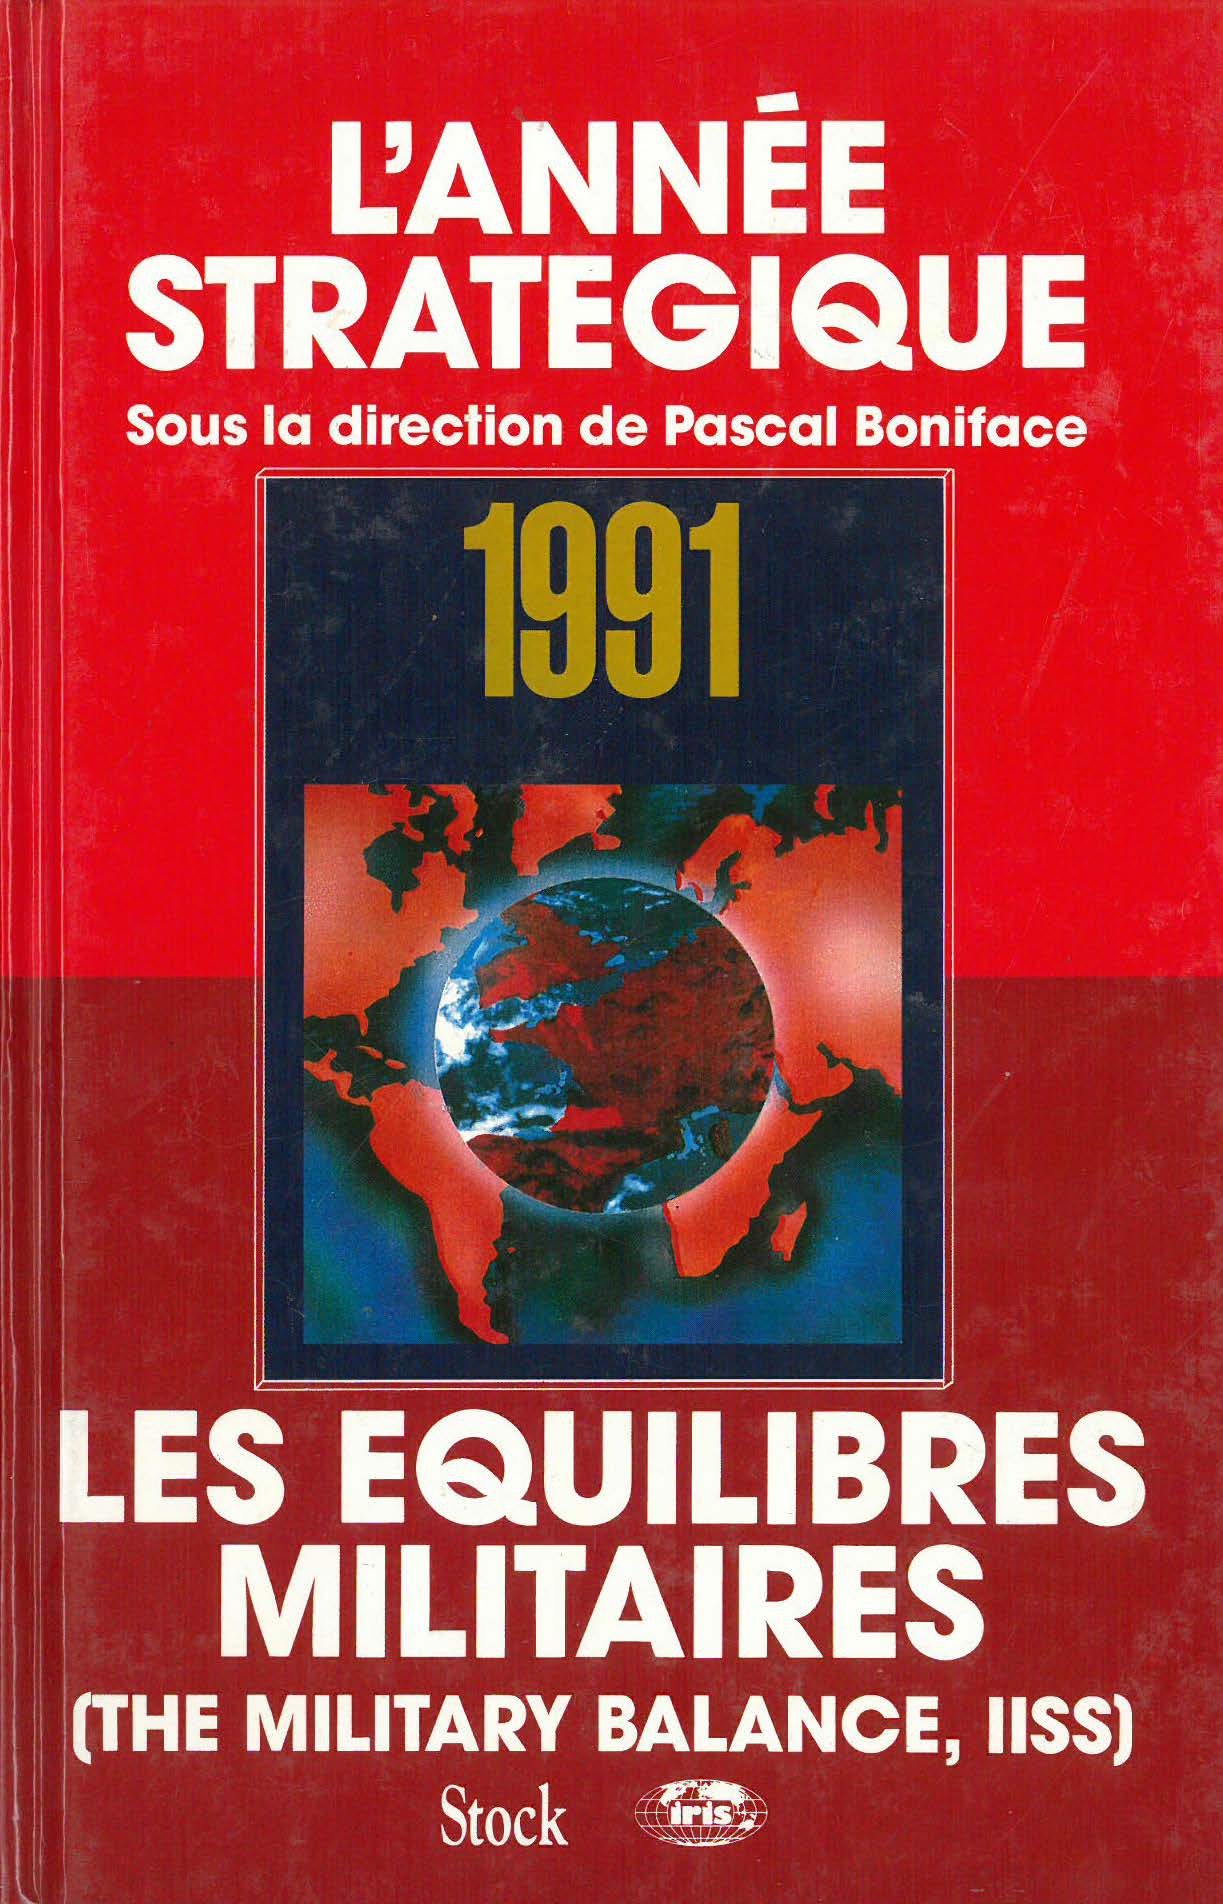 AS 1991